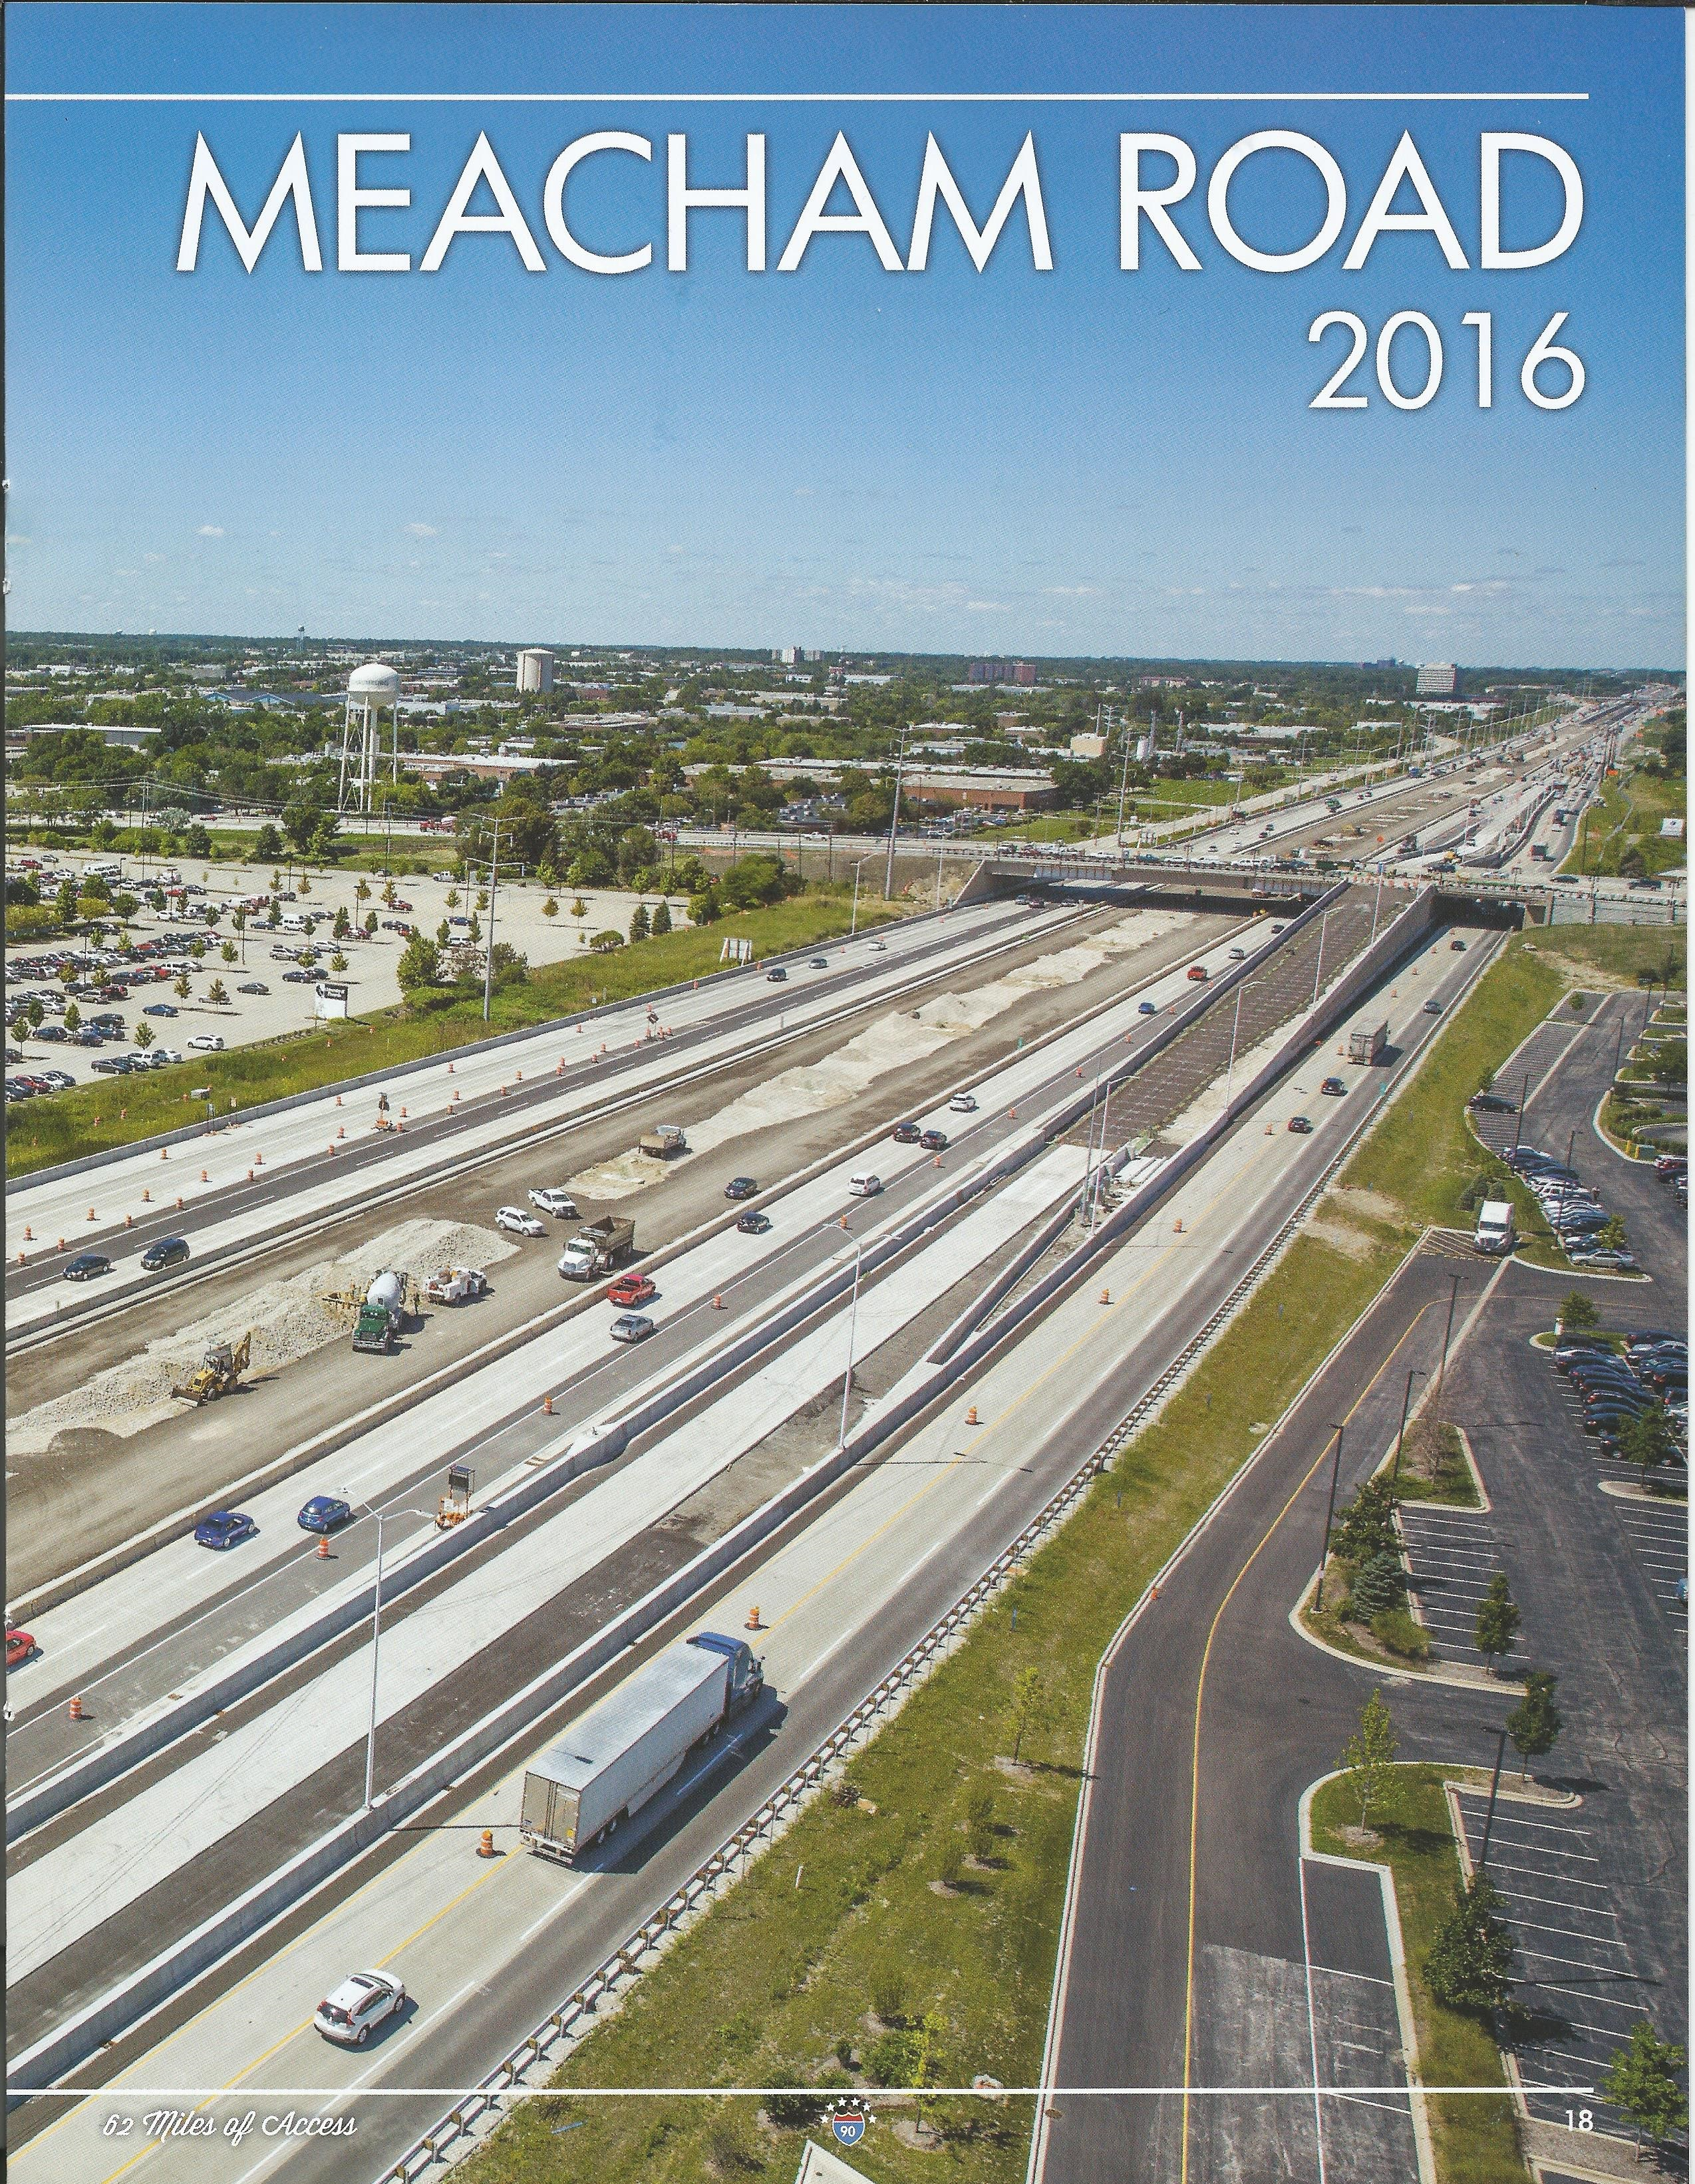 Meacham road 2016